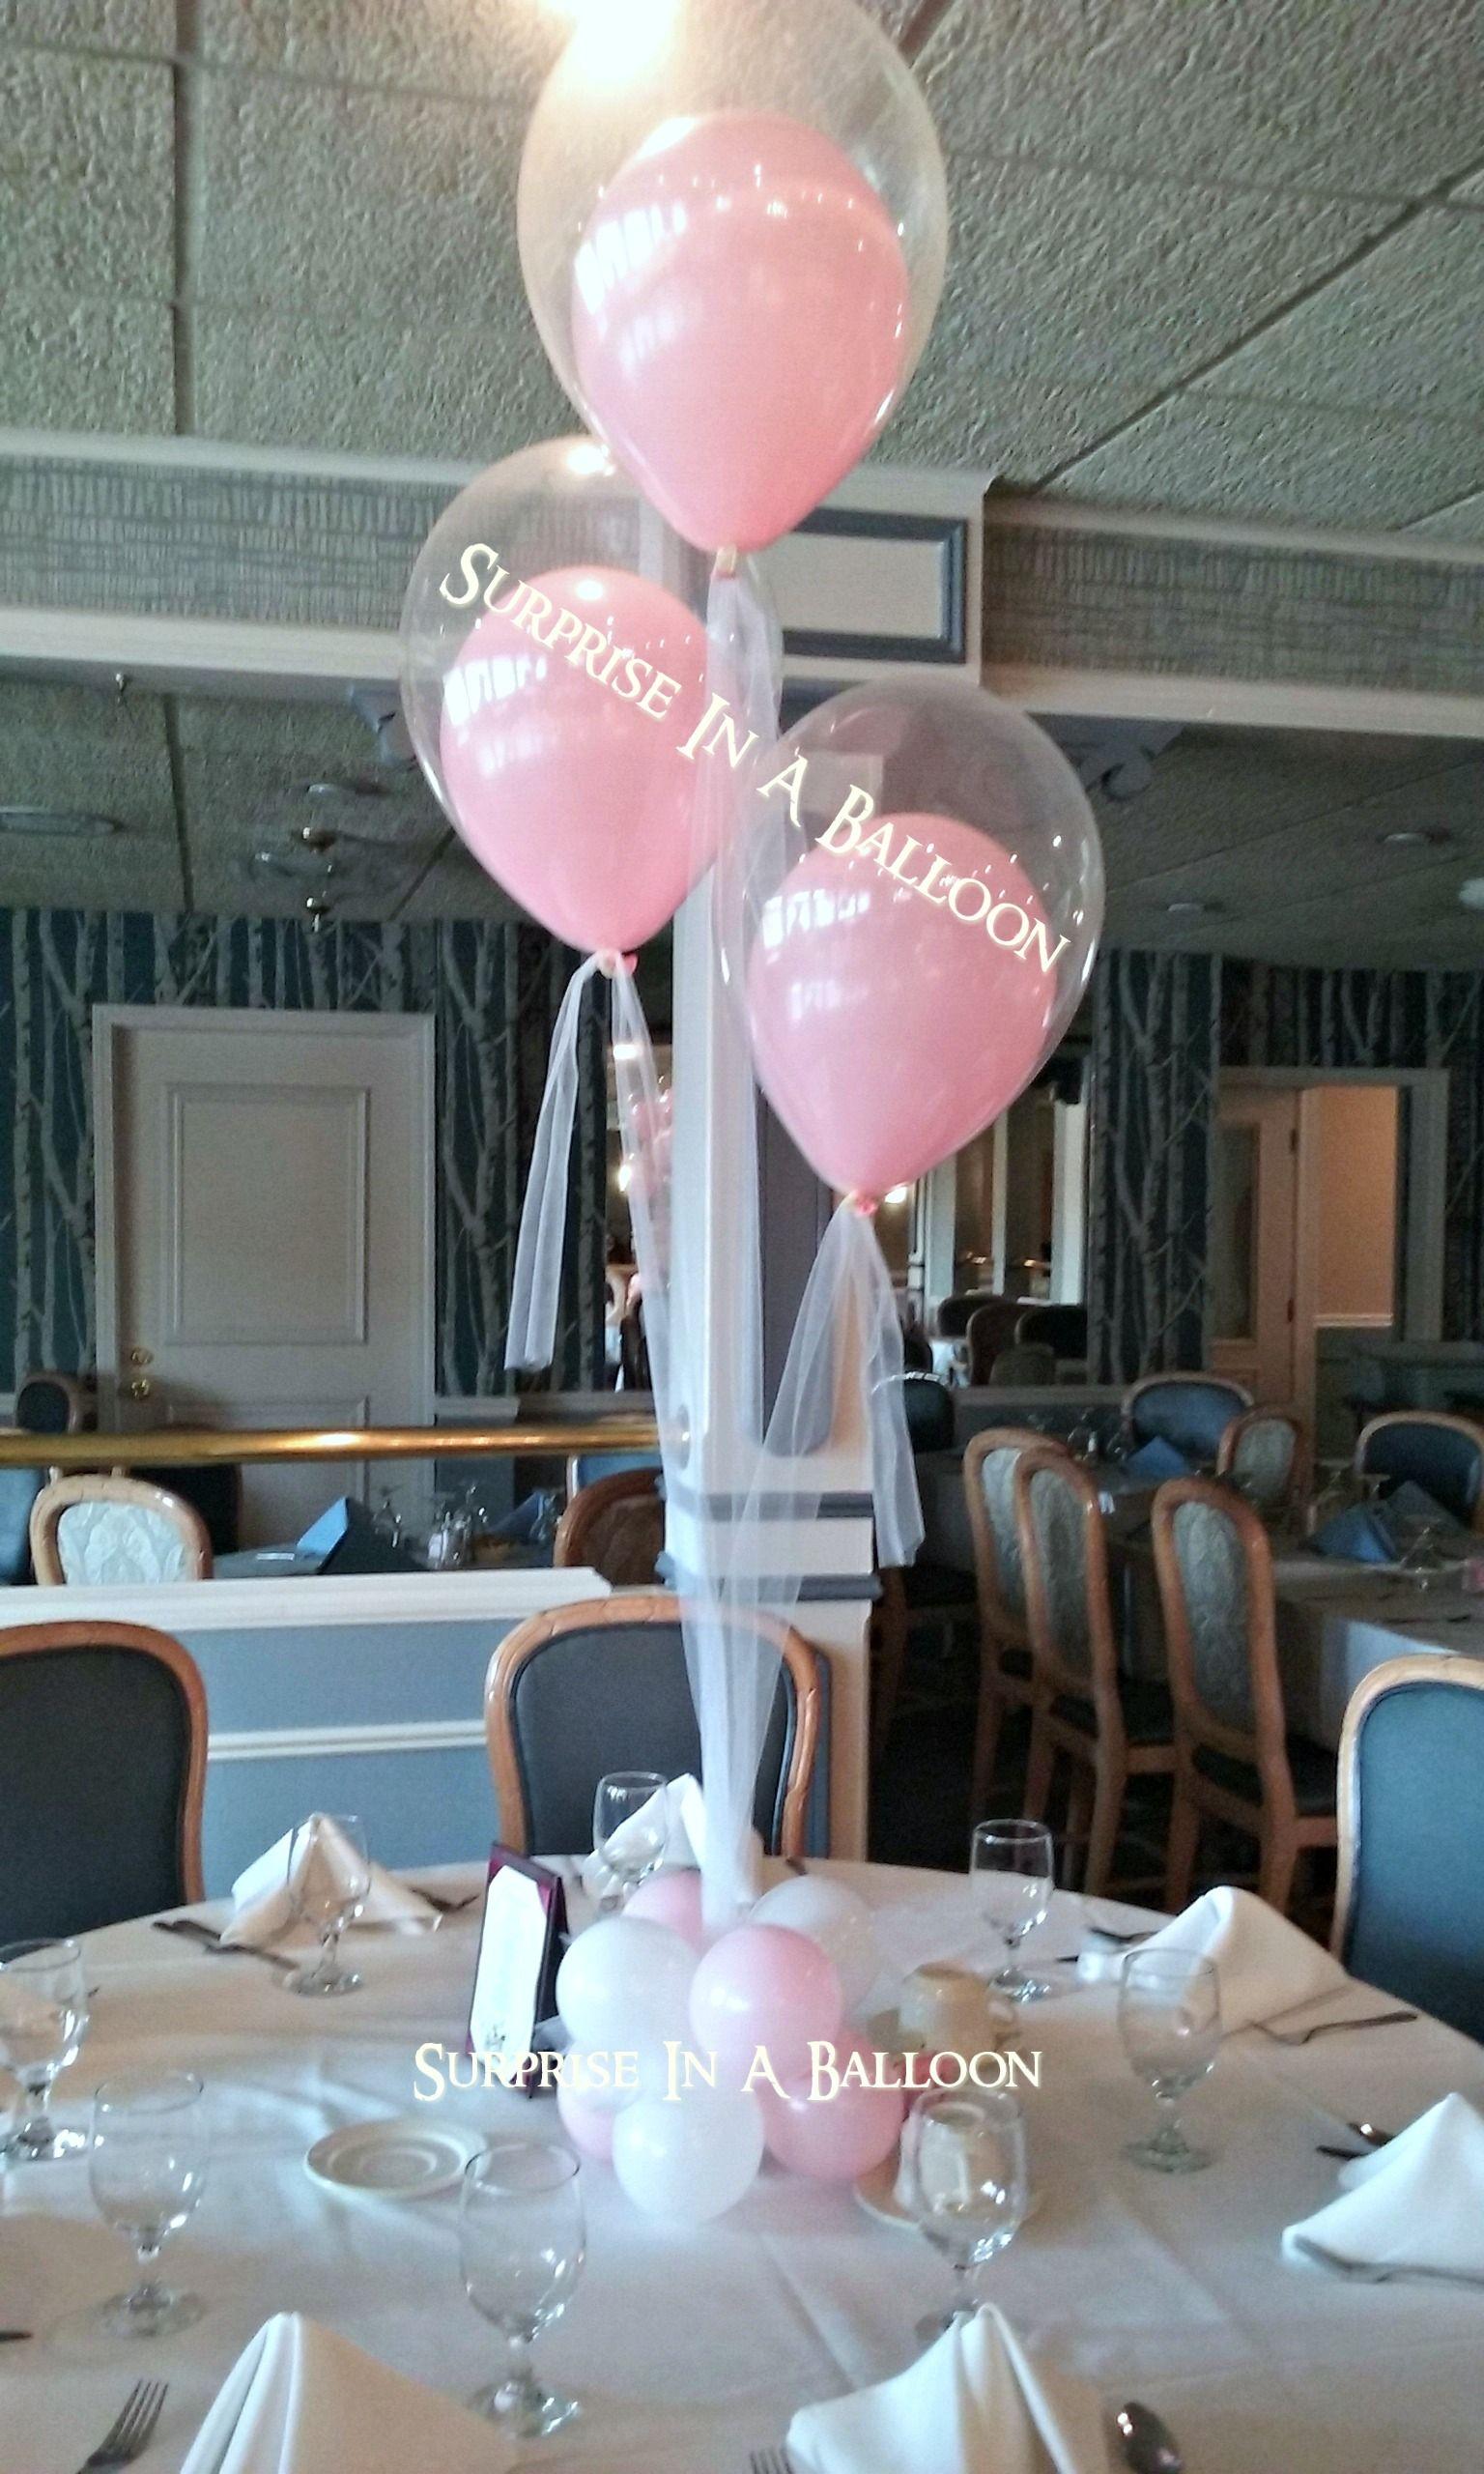 #elegant stuff balloon with tulle# #surprise in a balloon#